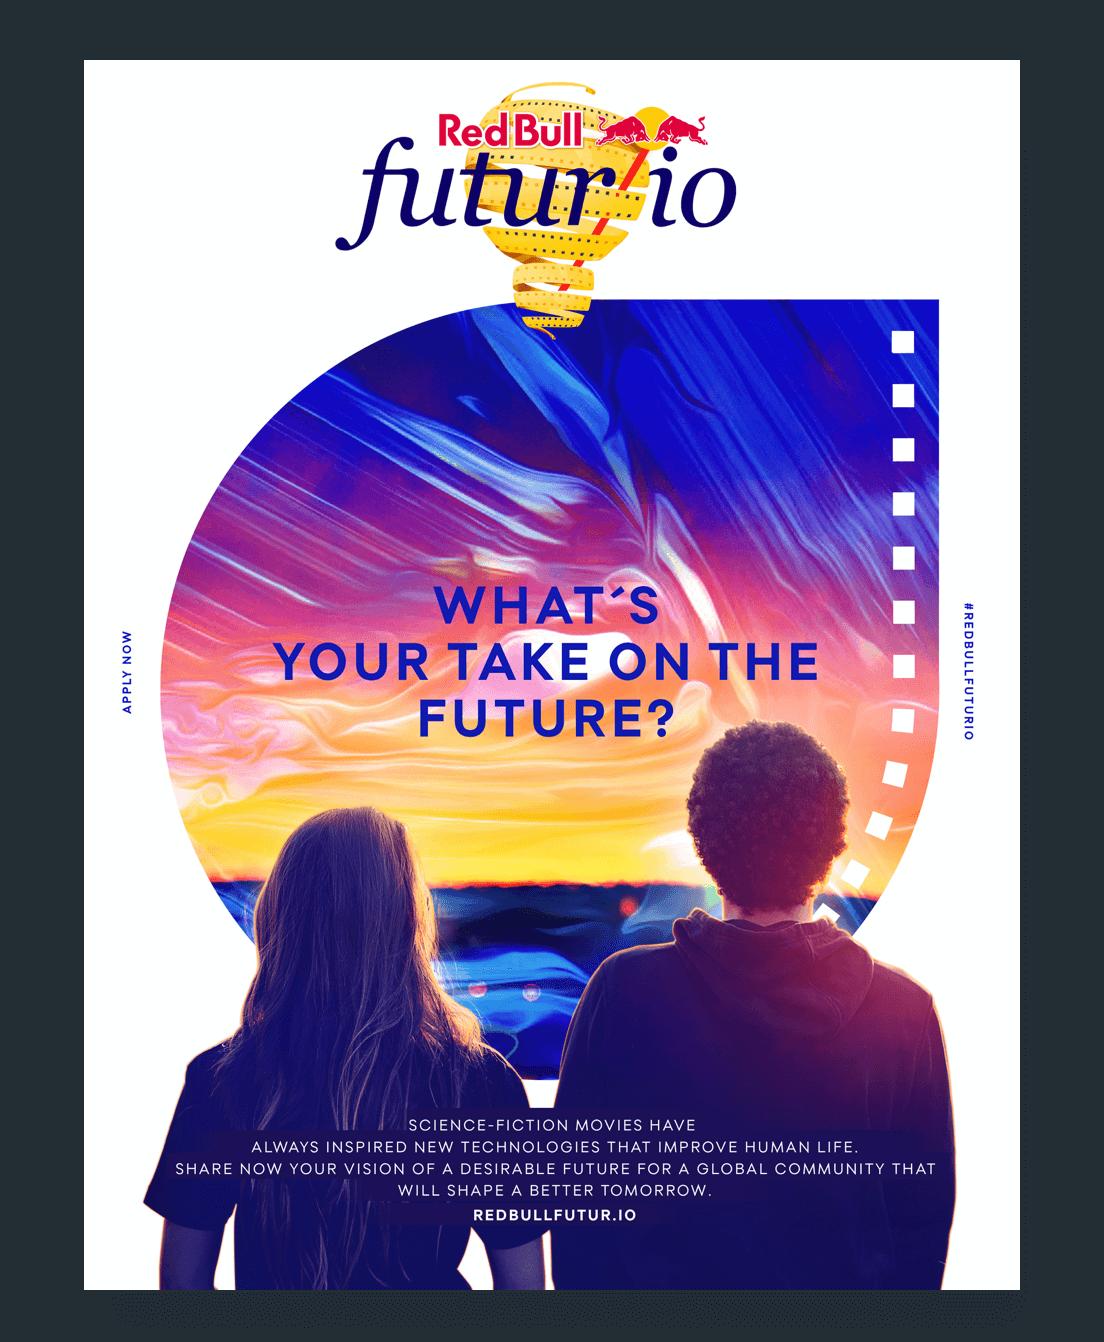 The futur/io key visual